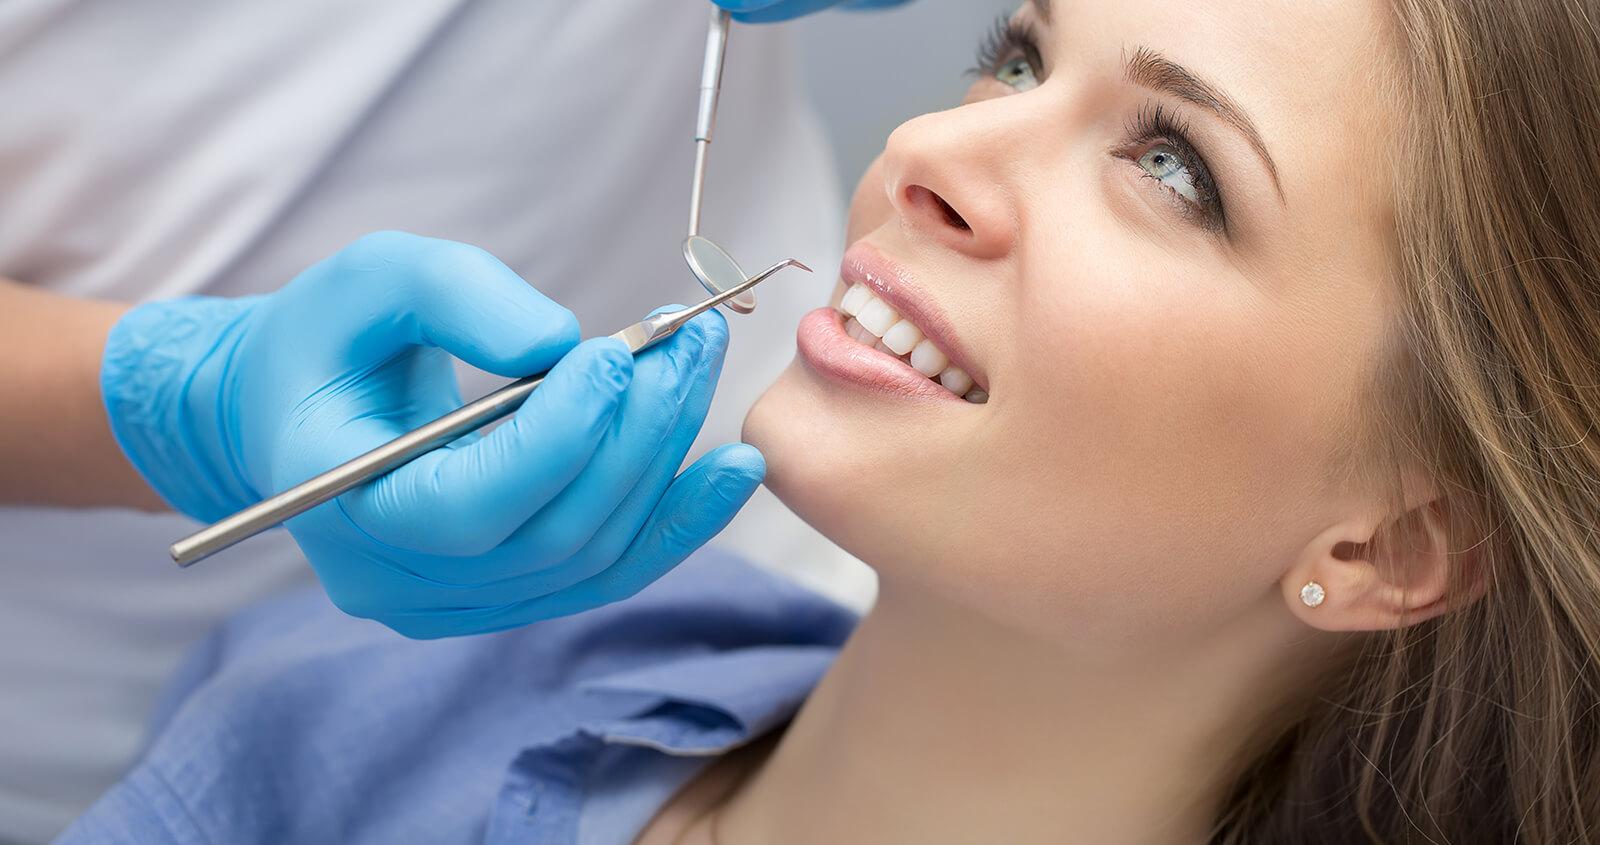 Teeth Whitening Process at Vineyard Dental Group in Santa Rosa CA Area